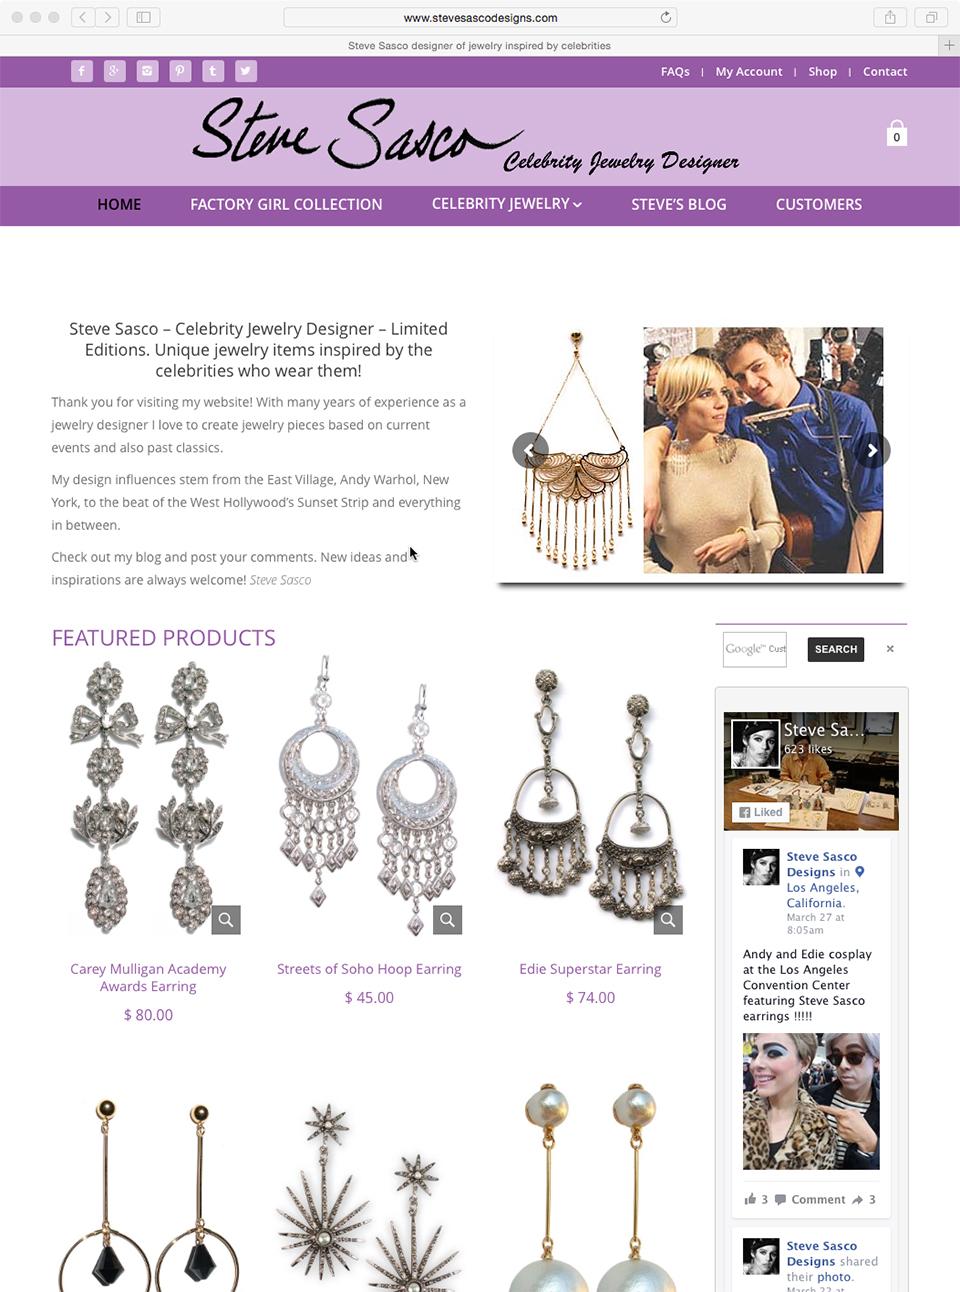 Steve Sasco Designs Jewelry